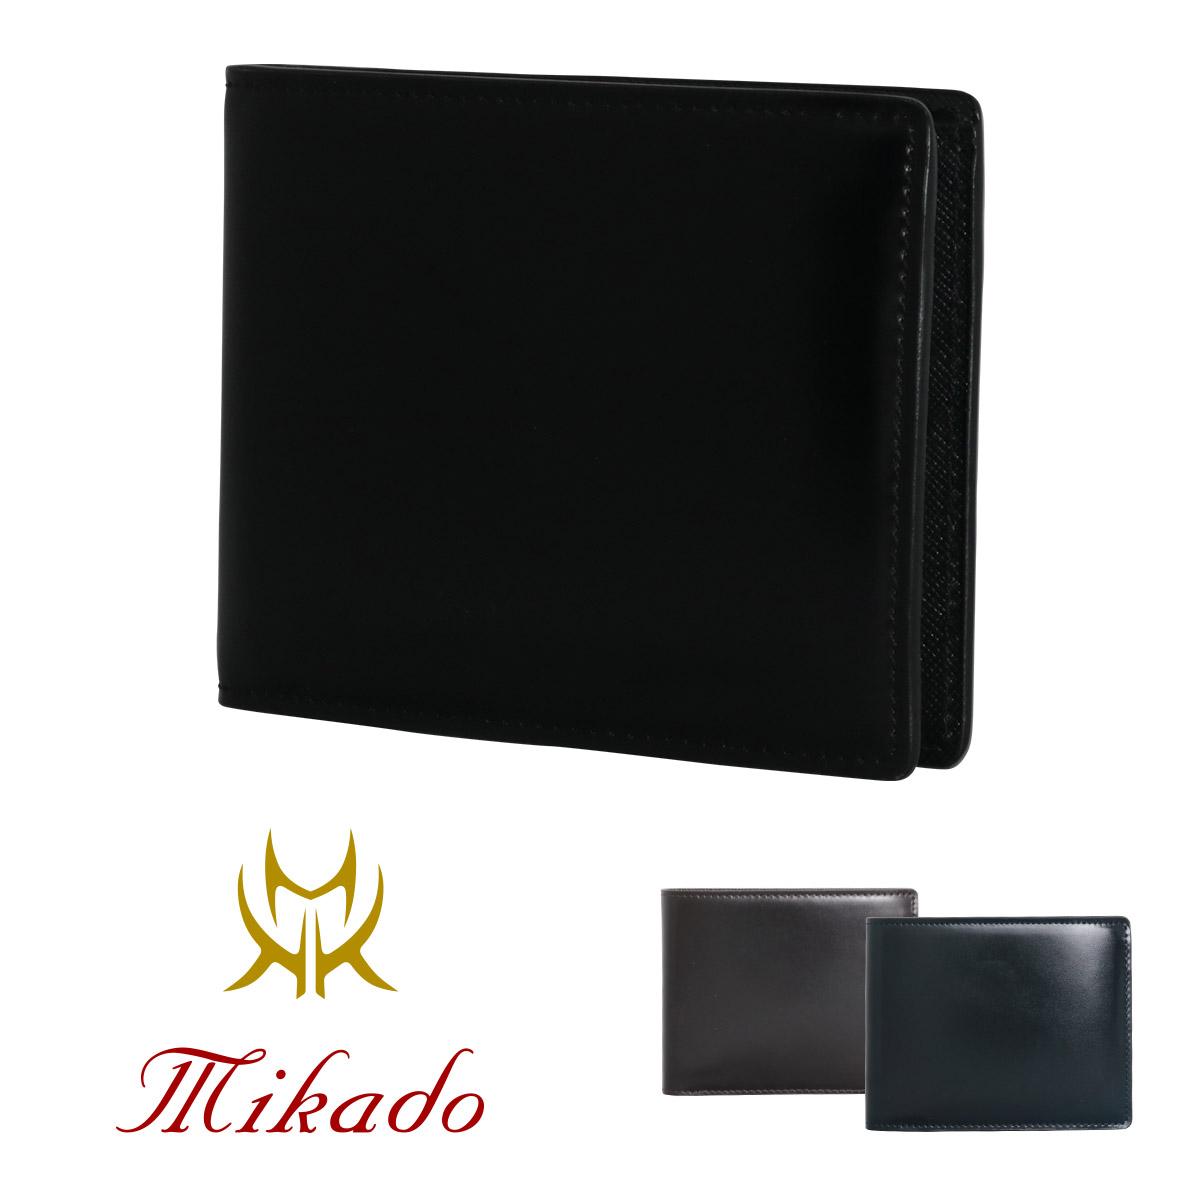 Mikado コードバン 二つ折り財布 小銭入れなし メンズ アリニン染 日本製 636015 ミカド レザー [PO5][bef][即日発送]